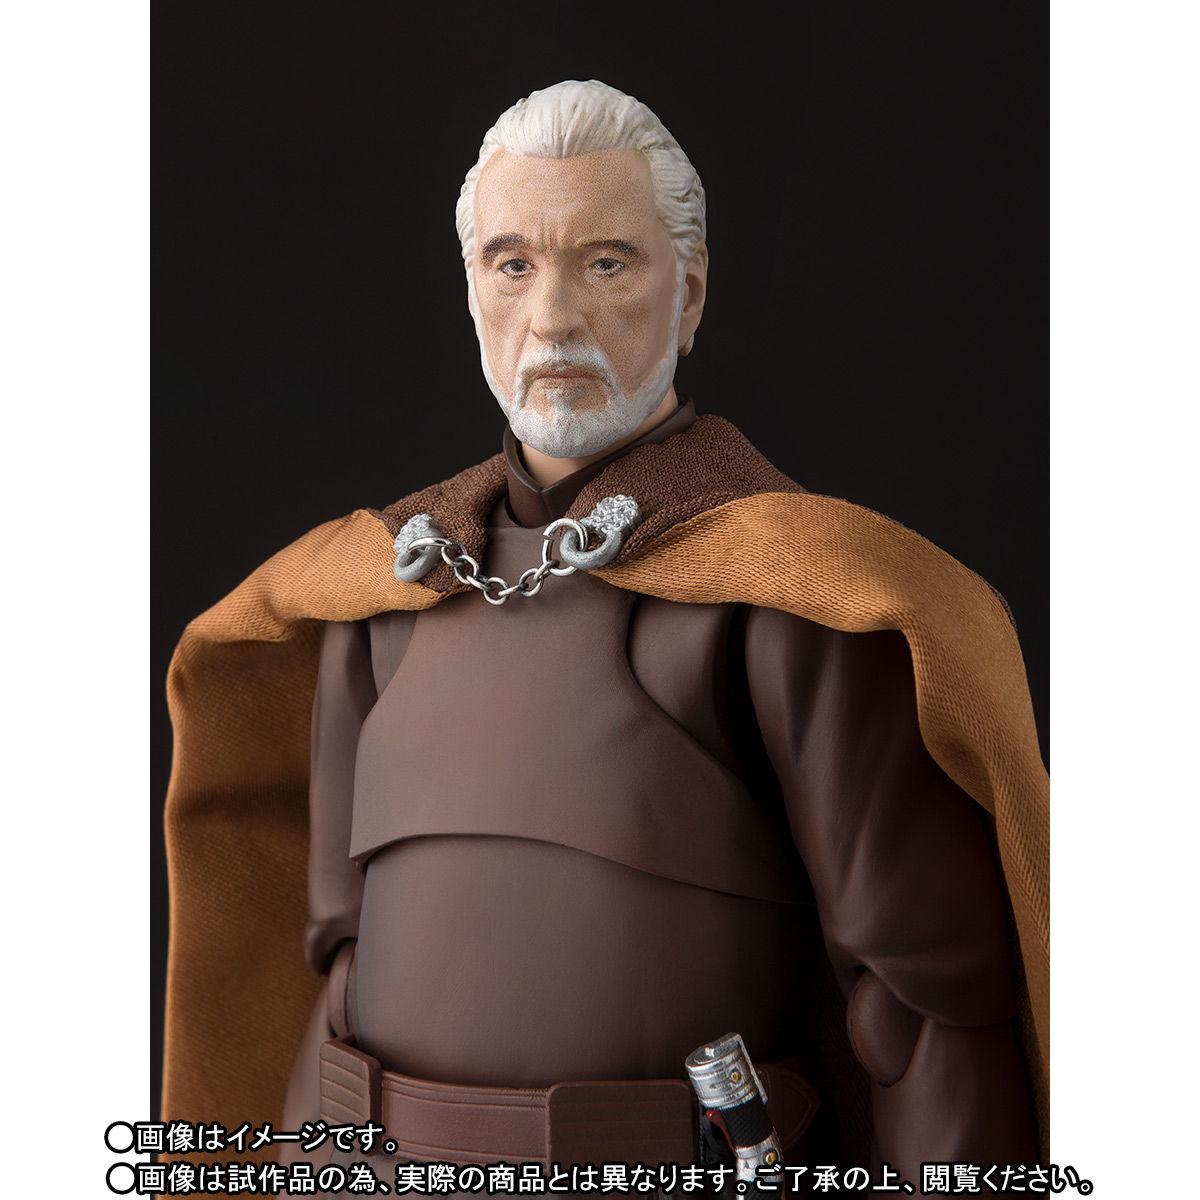 S.H.フィギュアーツ『ドゥークー伯爵』スター・ウォーズ 可動フィギュア-006